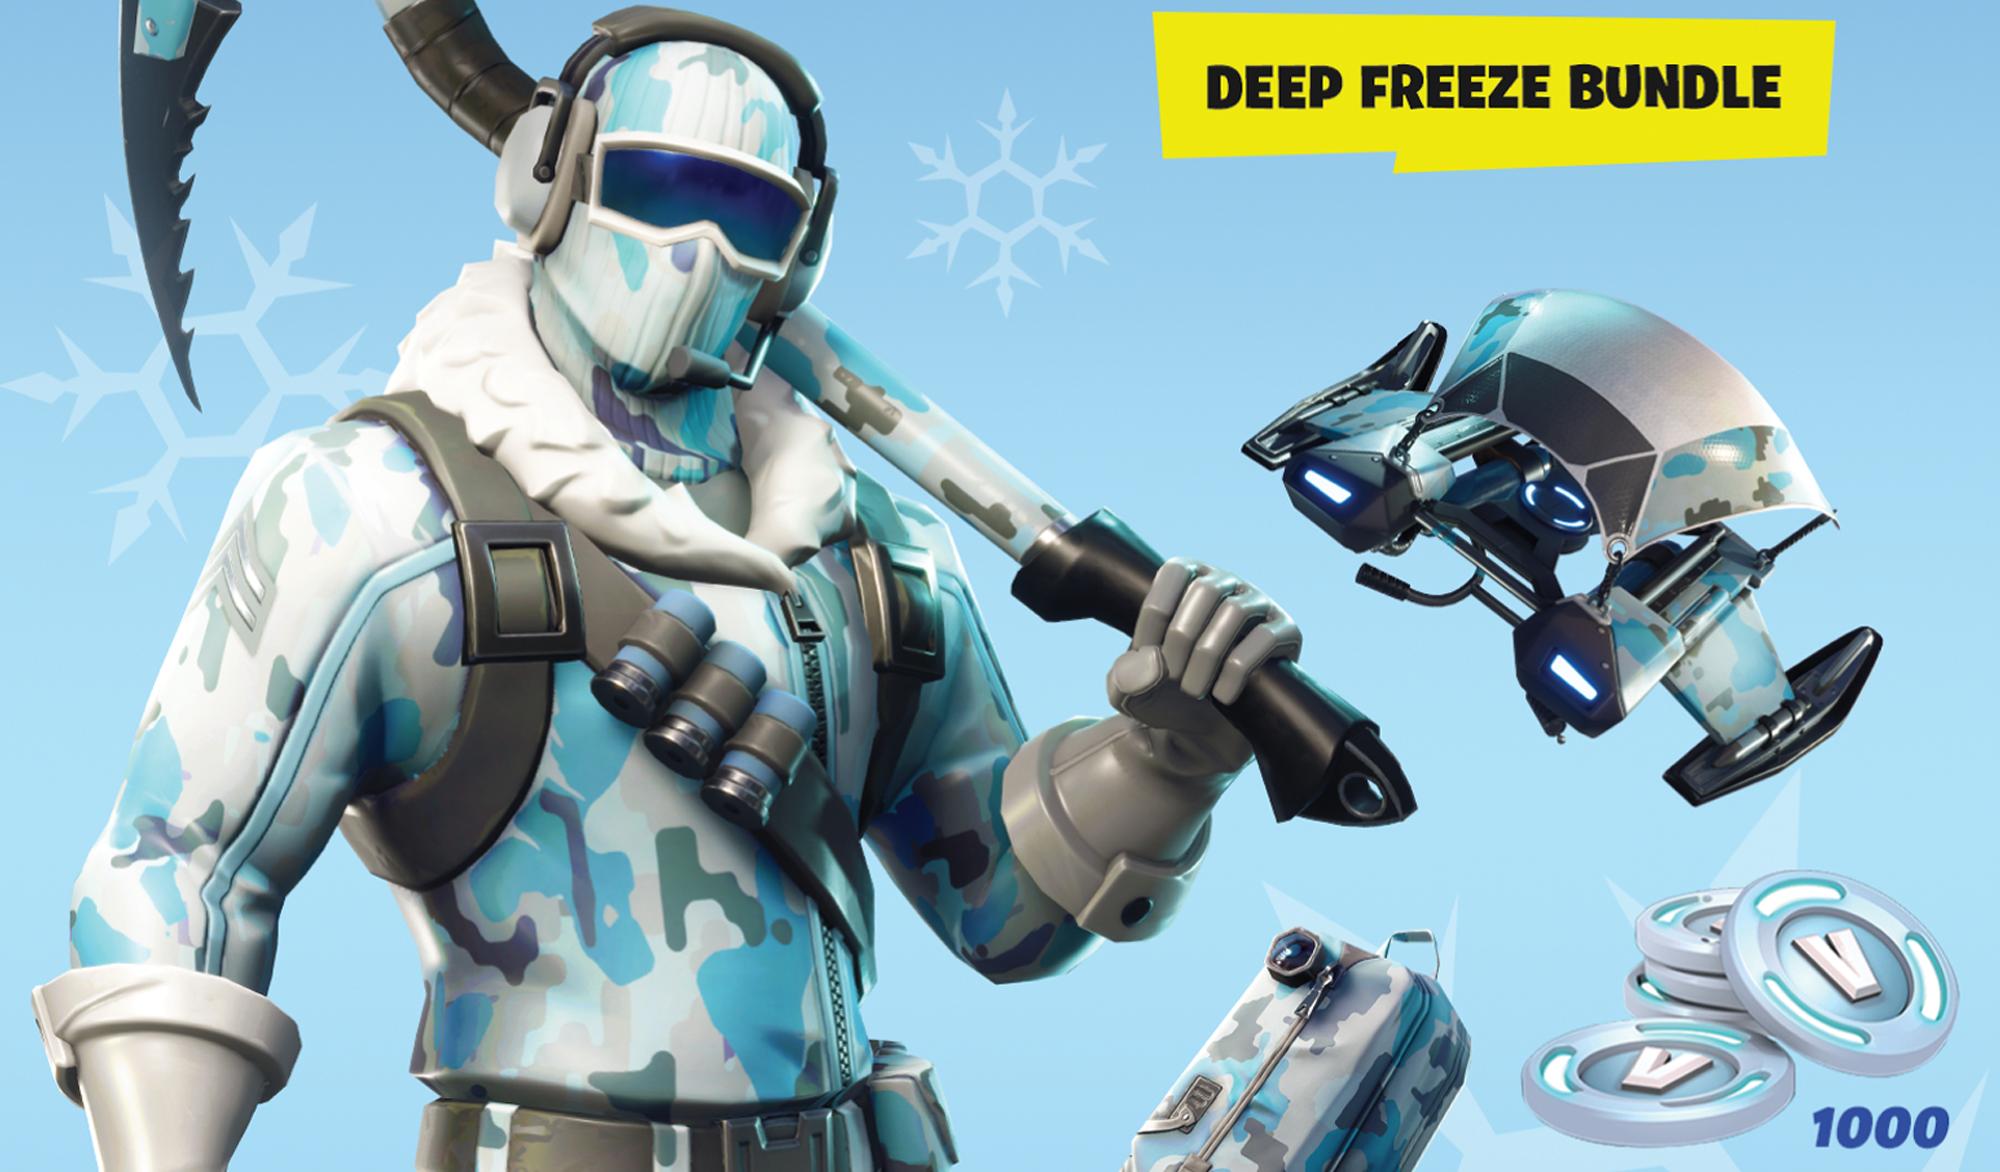 fortnite s deep freeze bundle leaves the game today - fortnite cobalt starter pack ps4